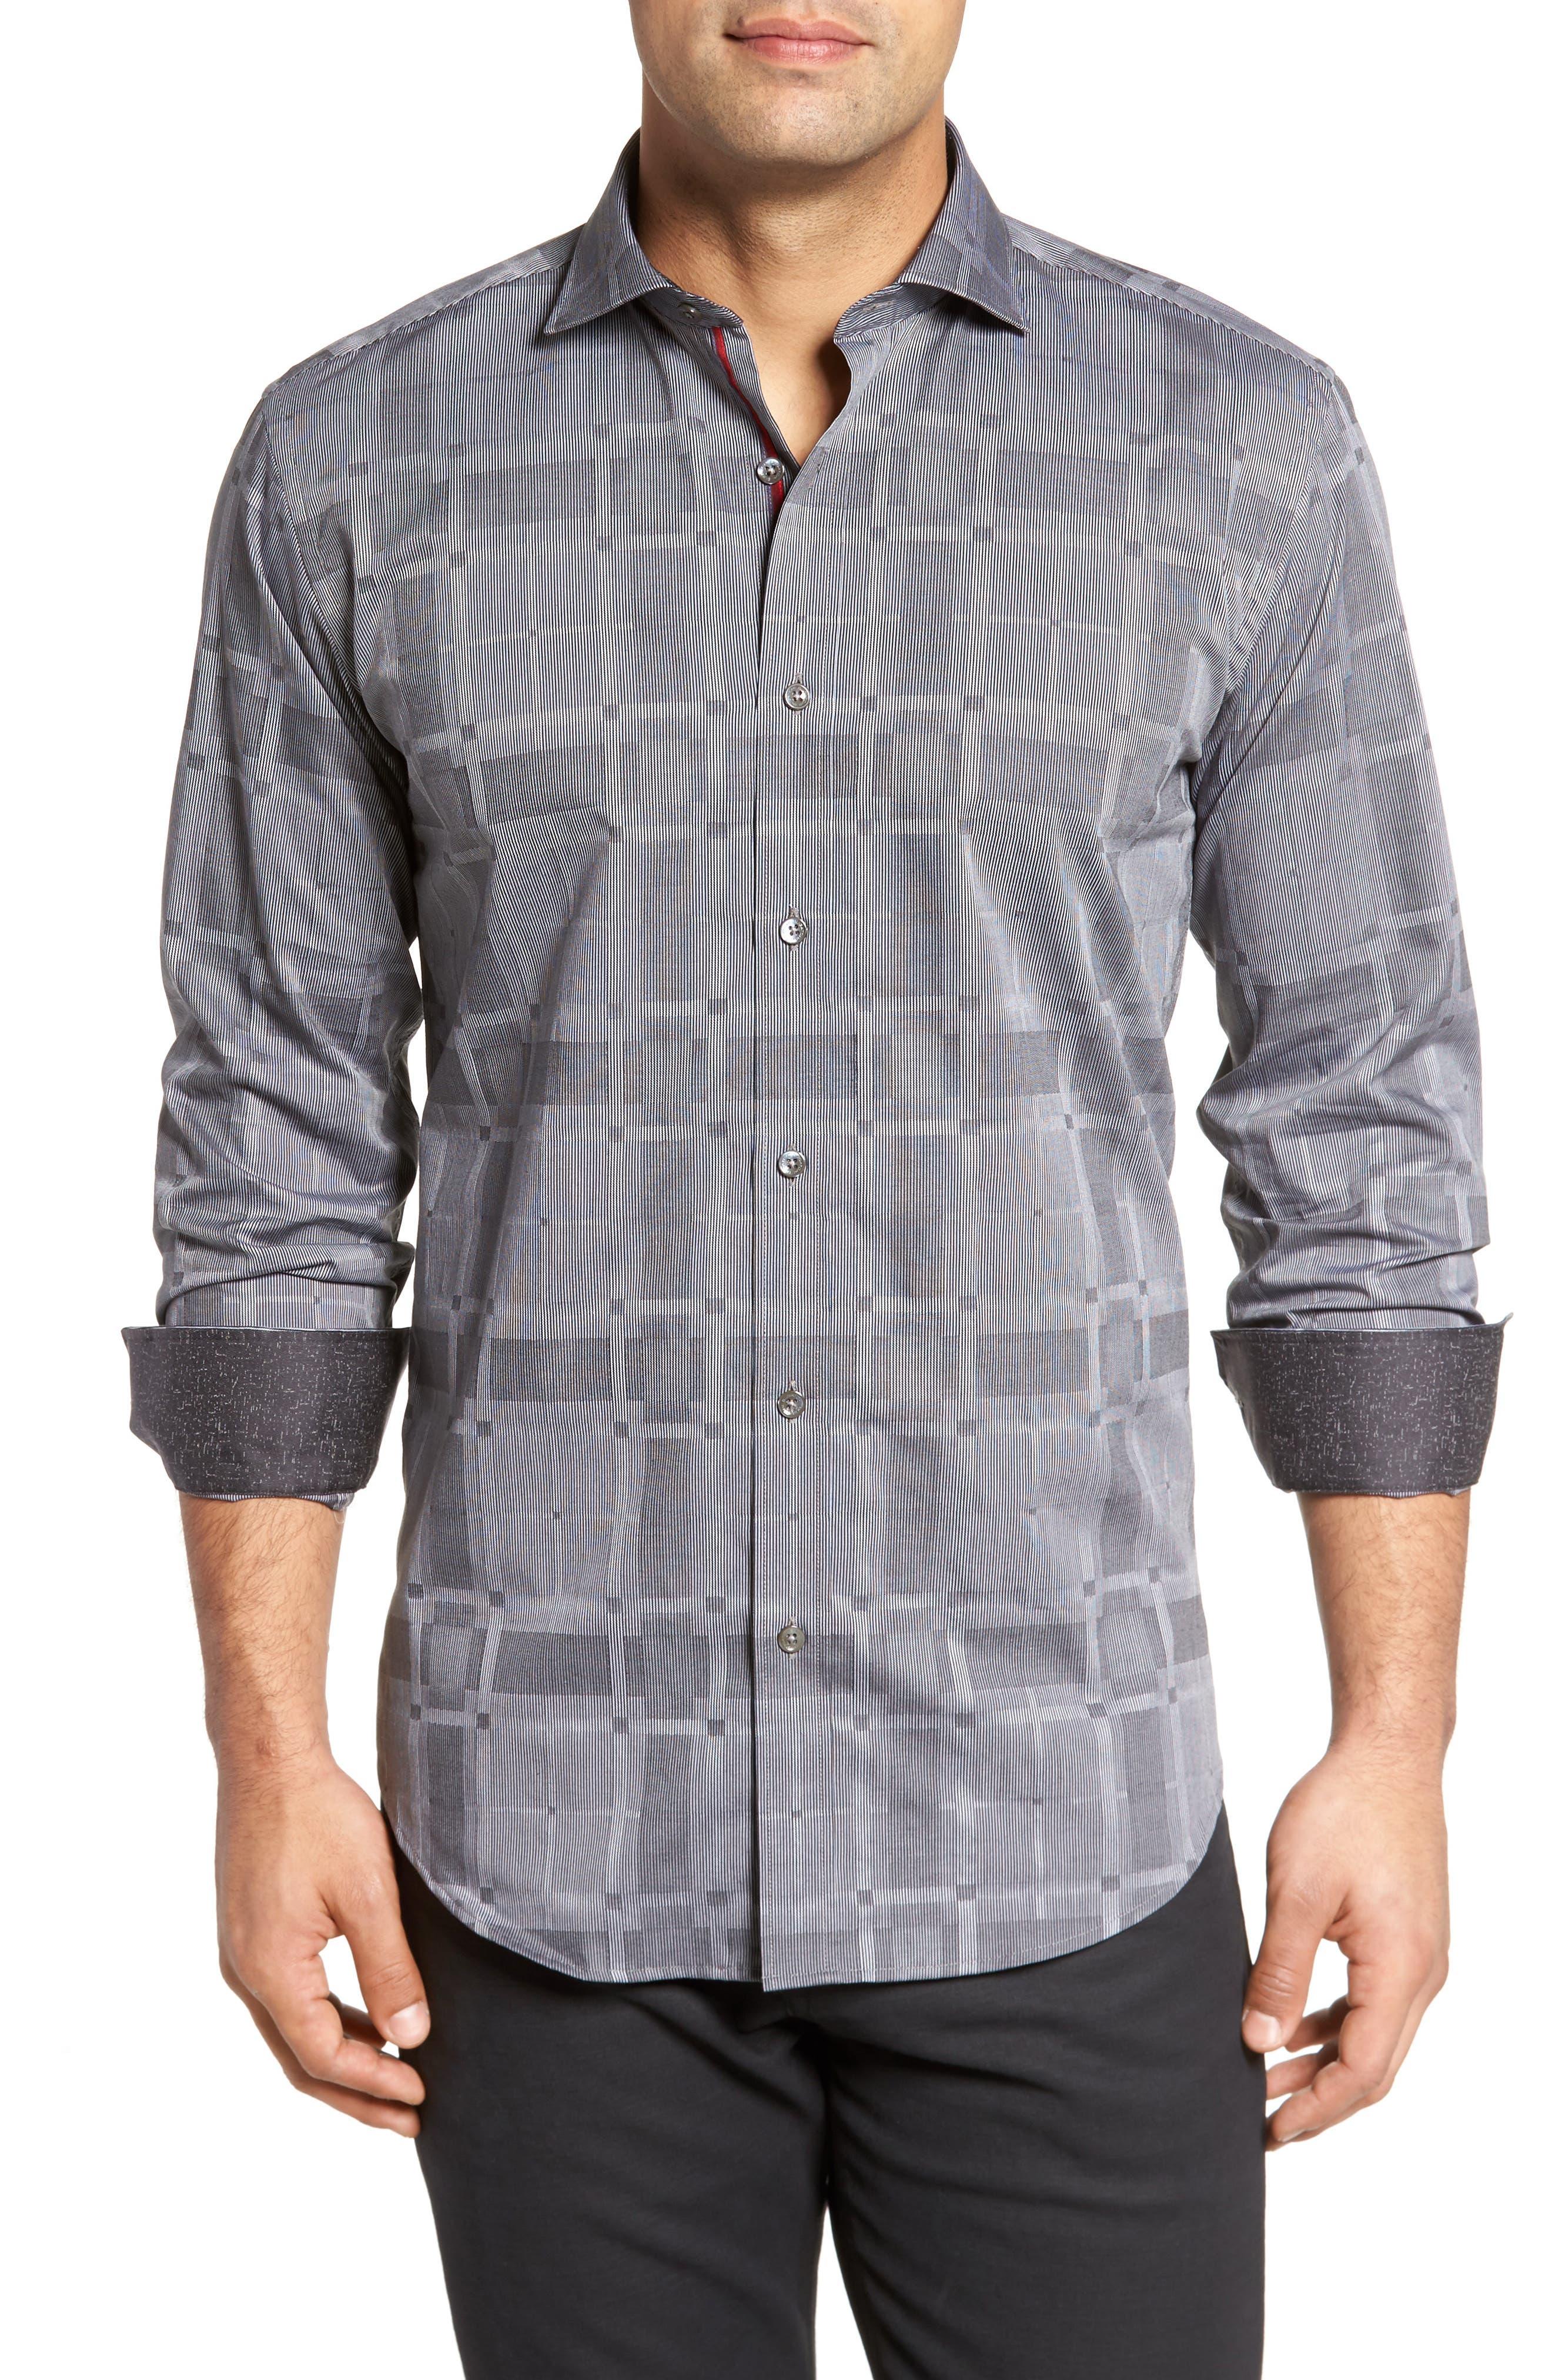 Alternate Image 1 Selected - Bugatchi Slim Fit Microstripe Plaid Sport Shirt